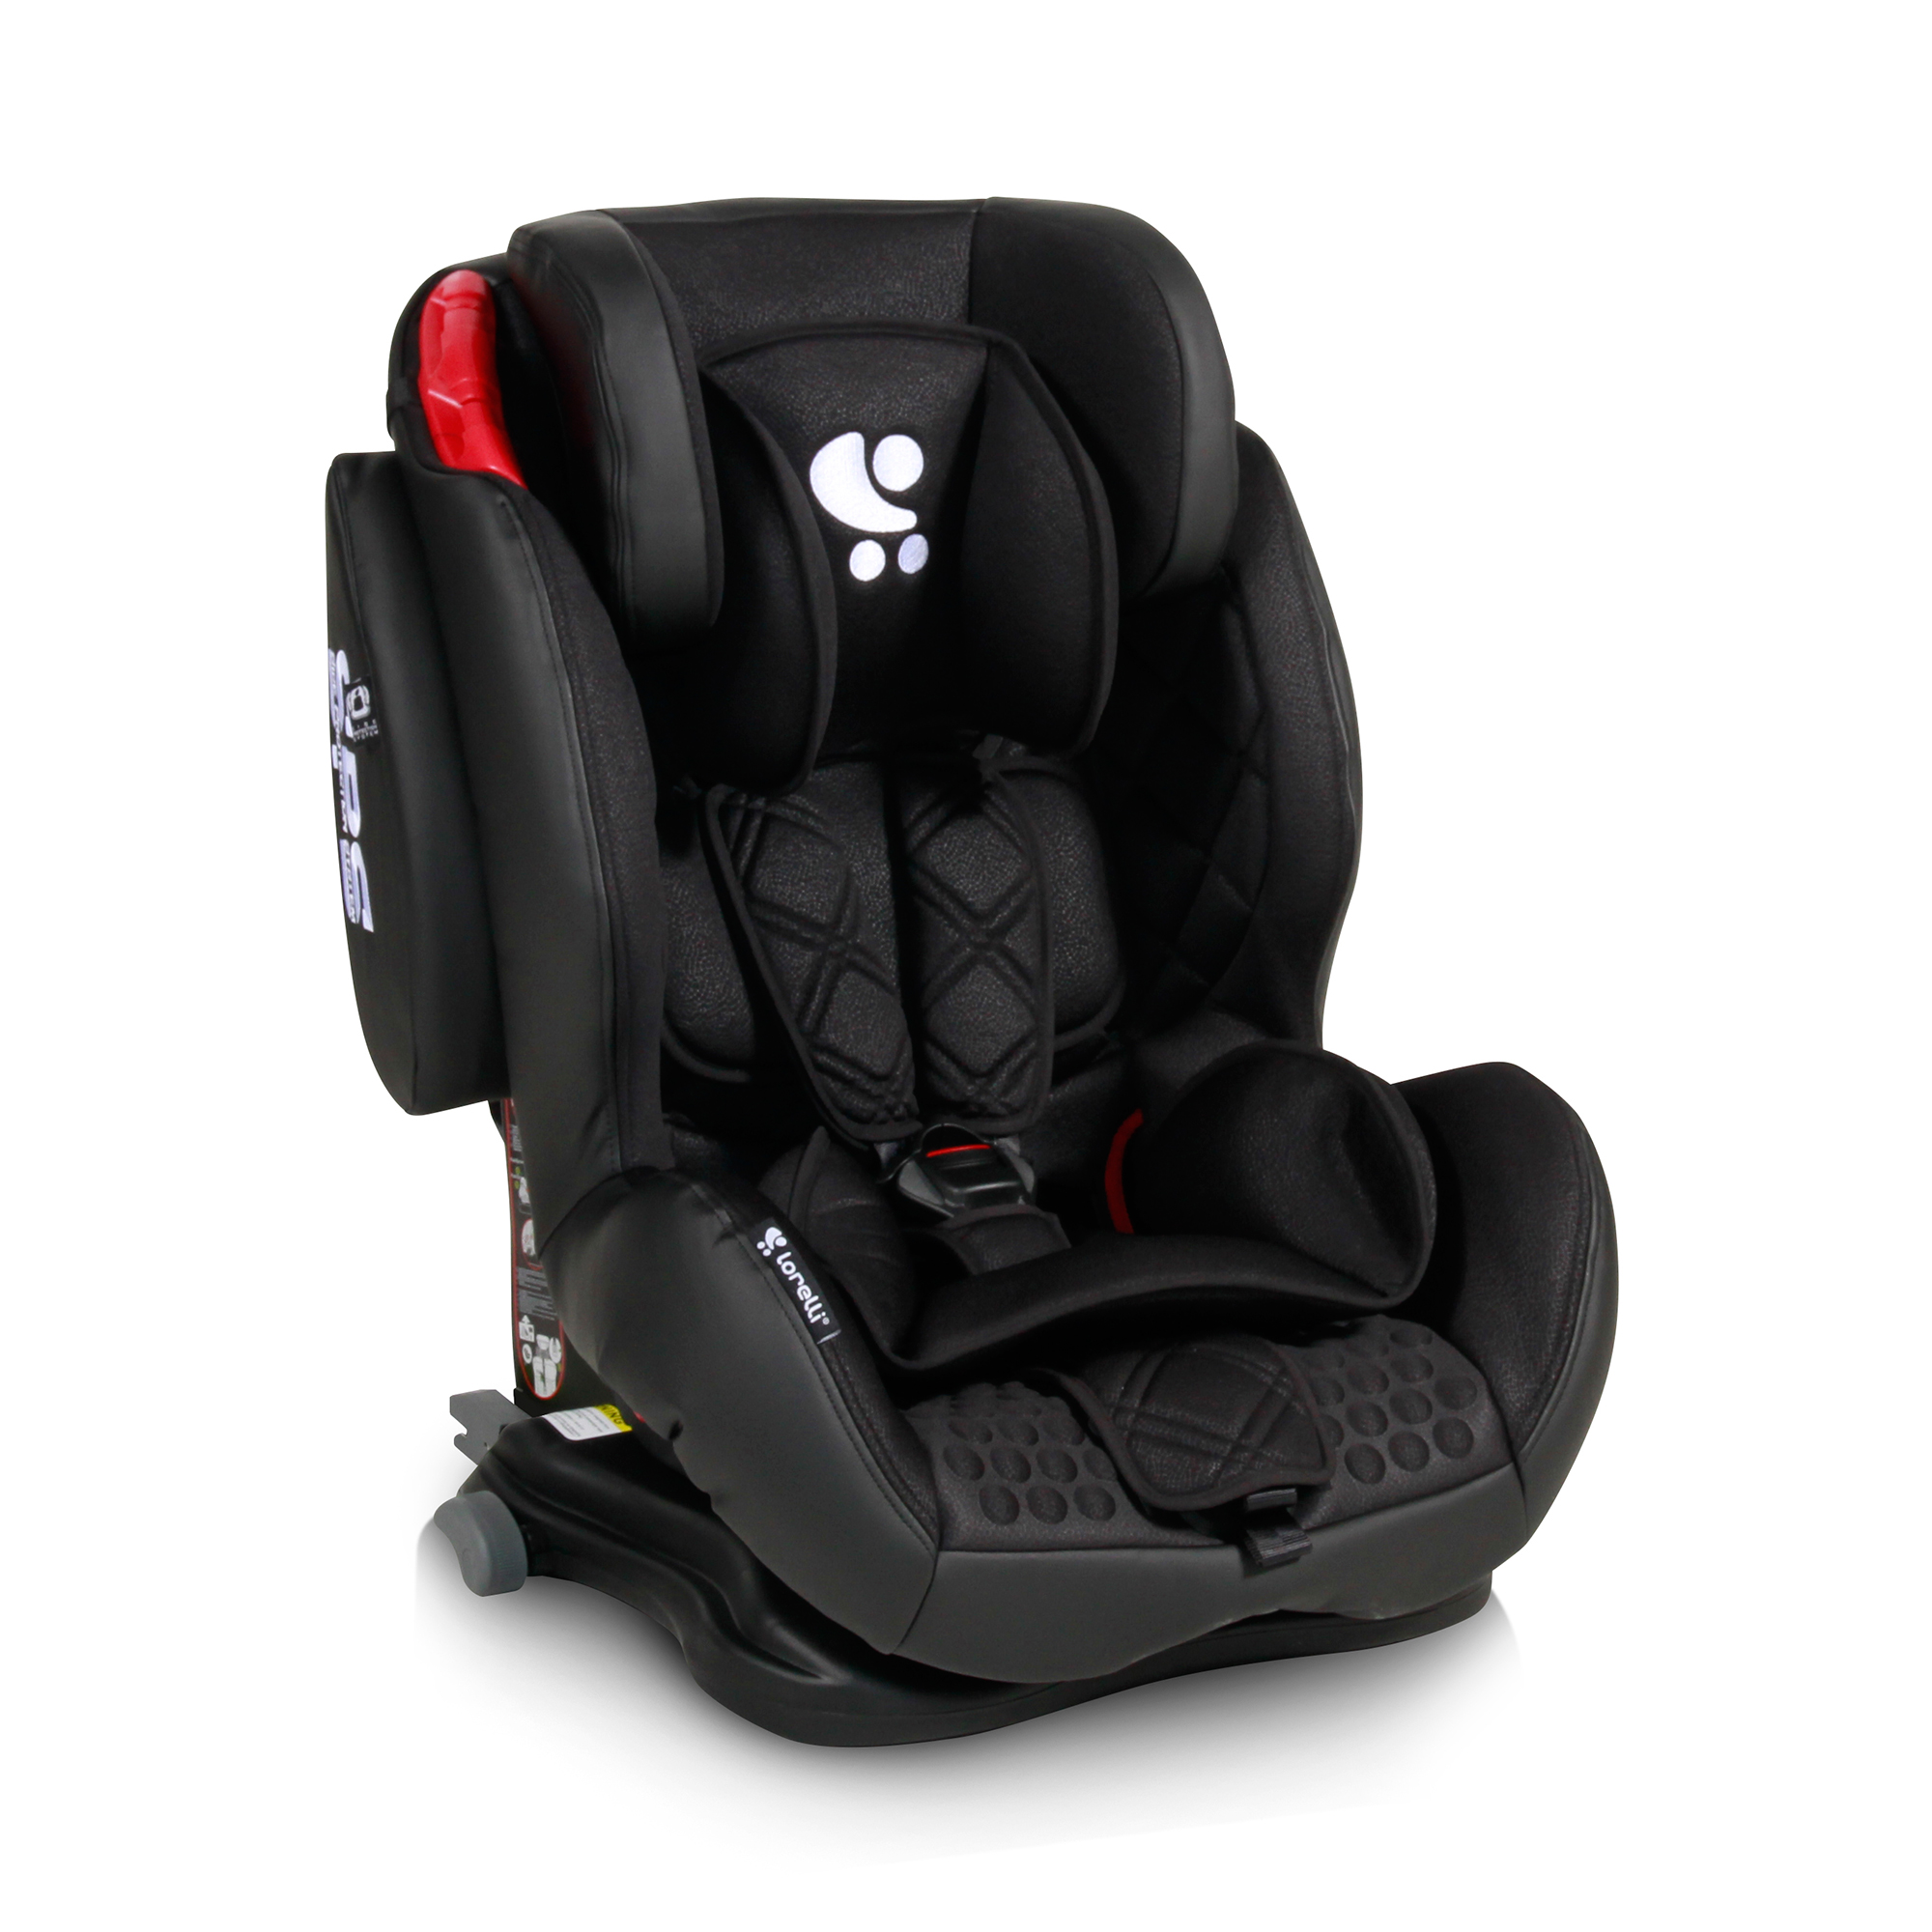 scaun auto copii lorelli premium titan +sps isofix - black leather